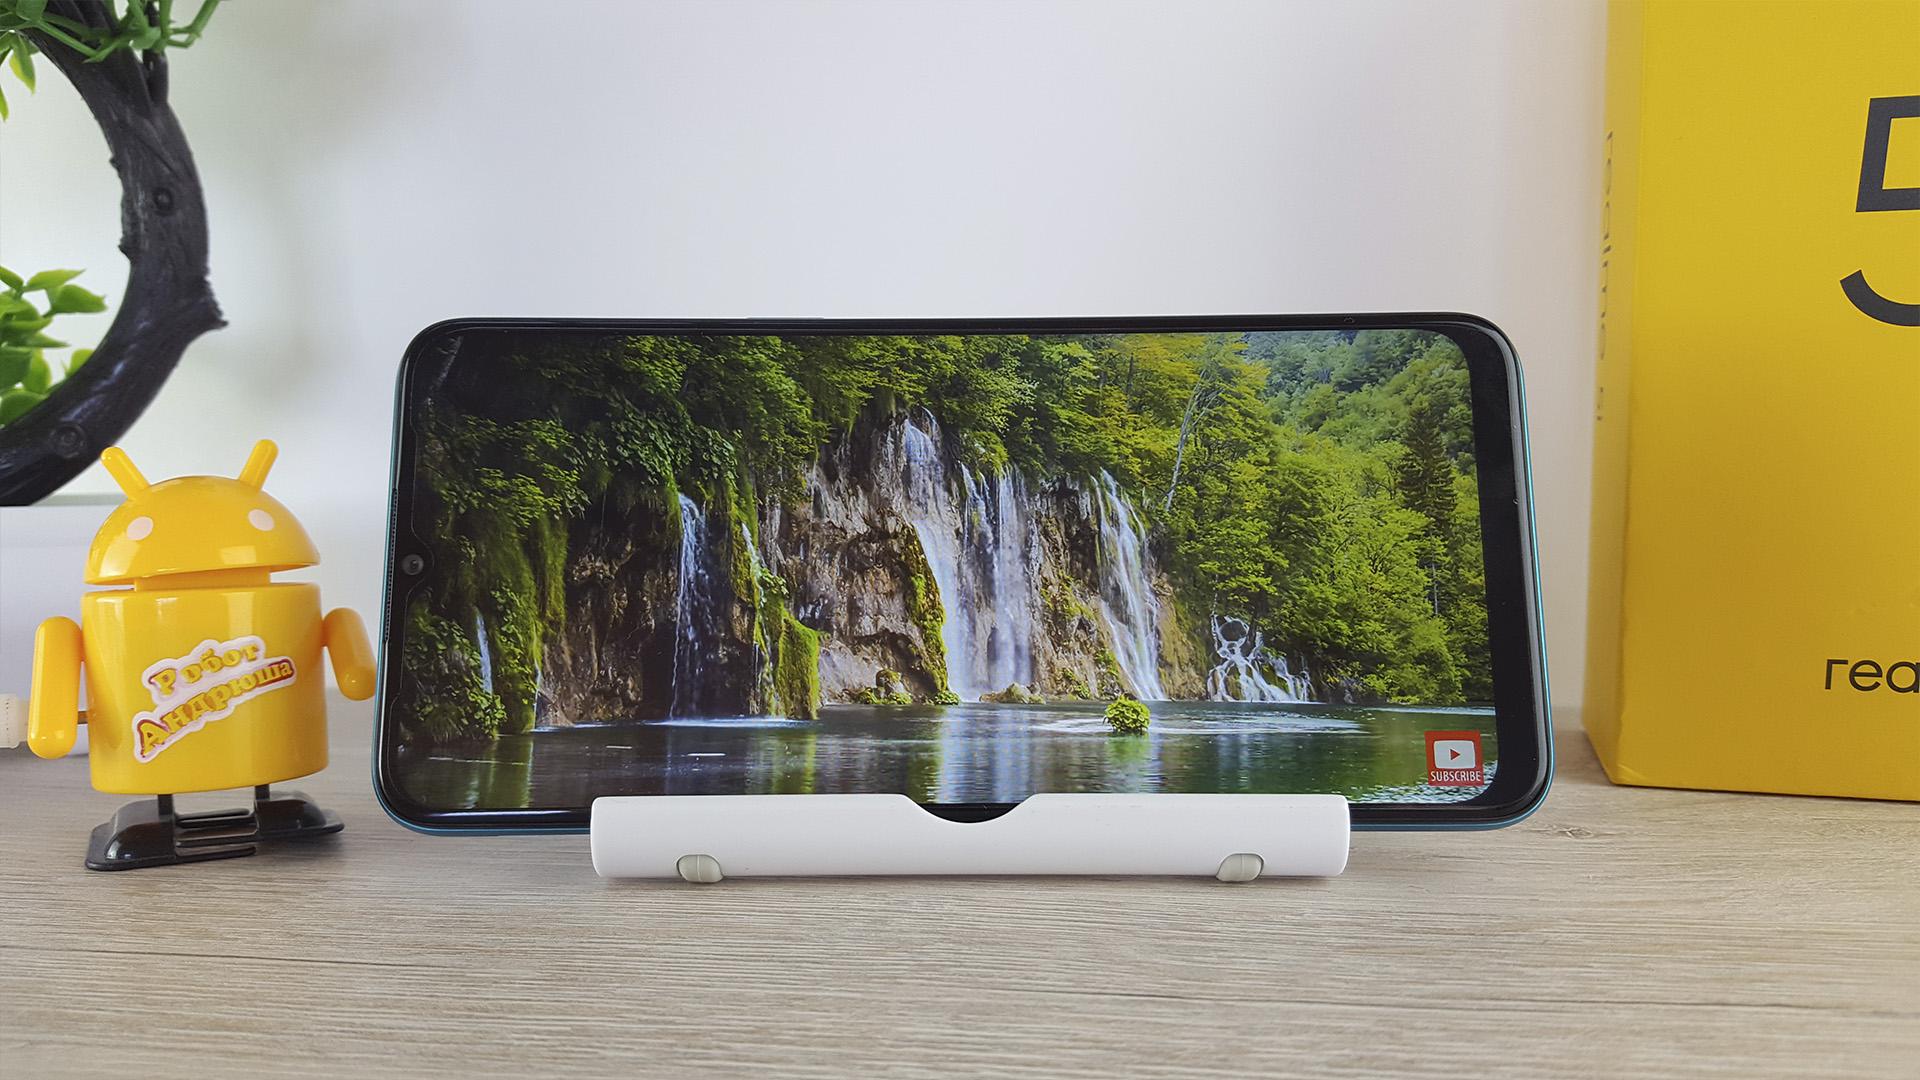 Обзор Realme 5i экран дисплей разрешение youtube